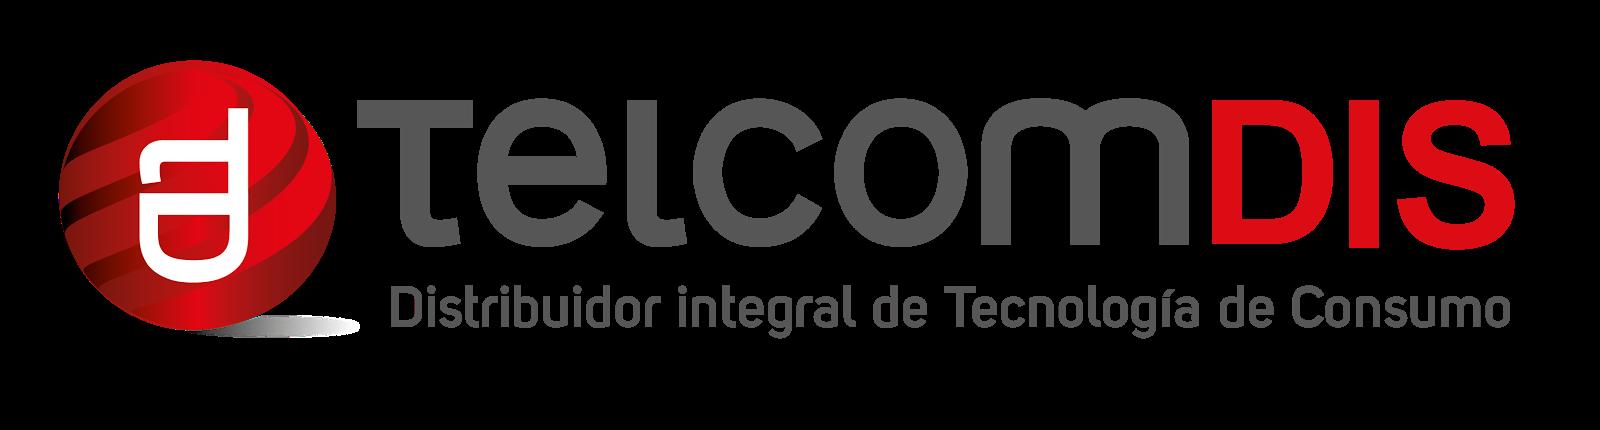 Telcomdis_logo